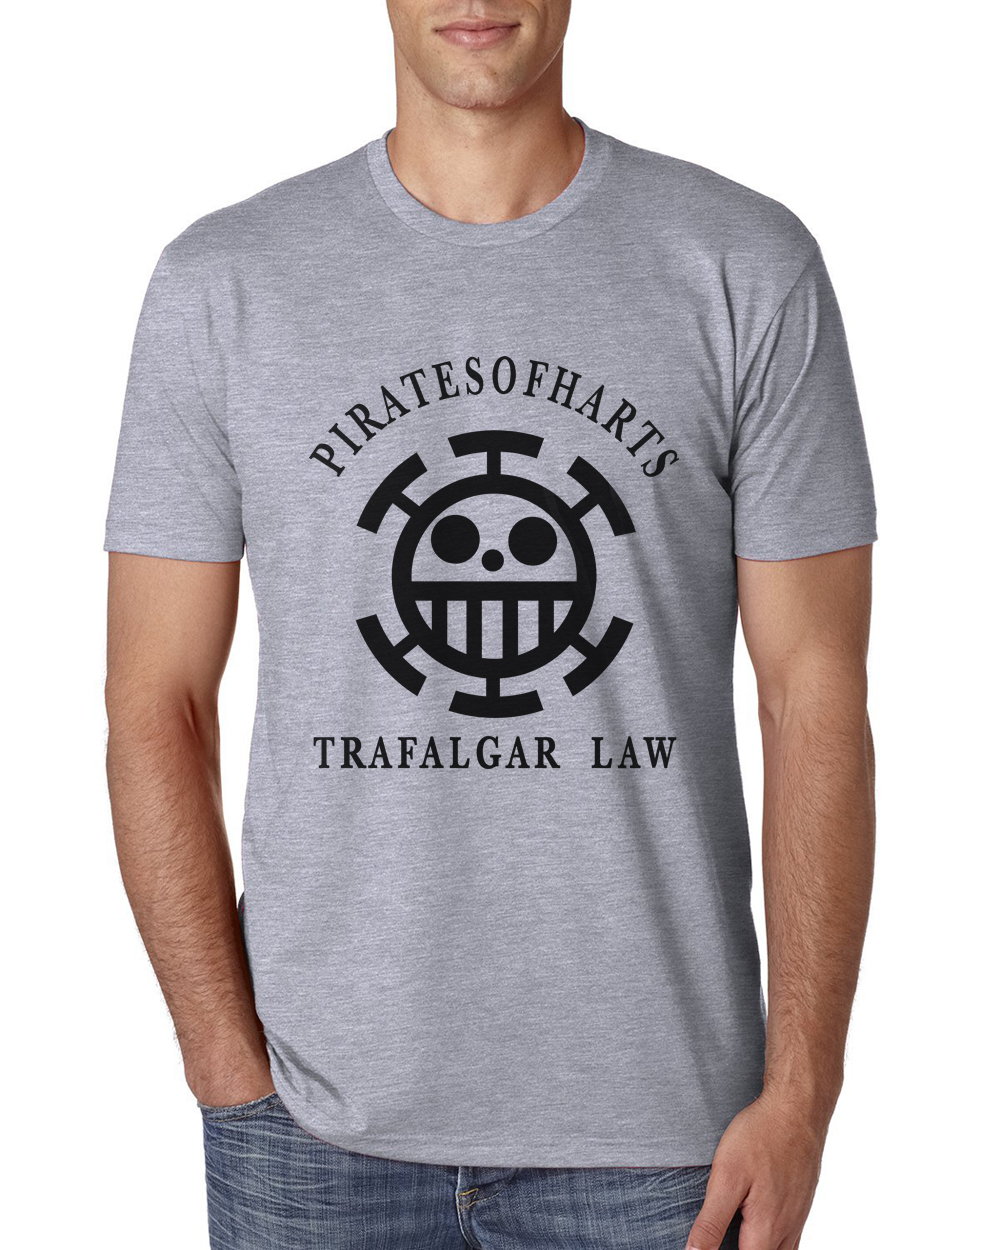 fashion top short sleeve camisetas 2019 men funny harajuku t-shirts new arrival fitness streetwear tee shirt homme summer